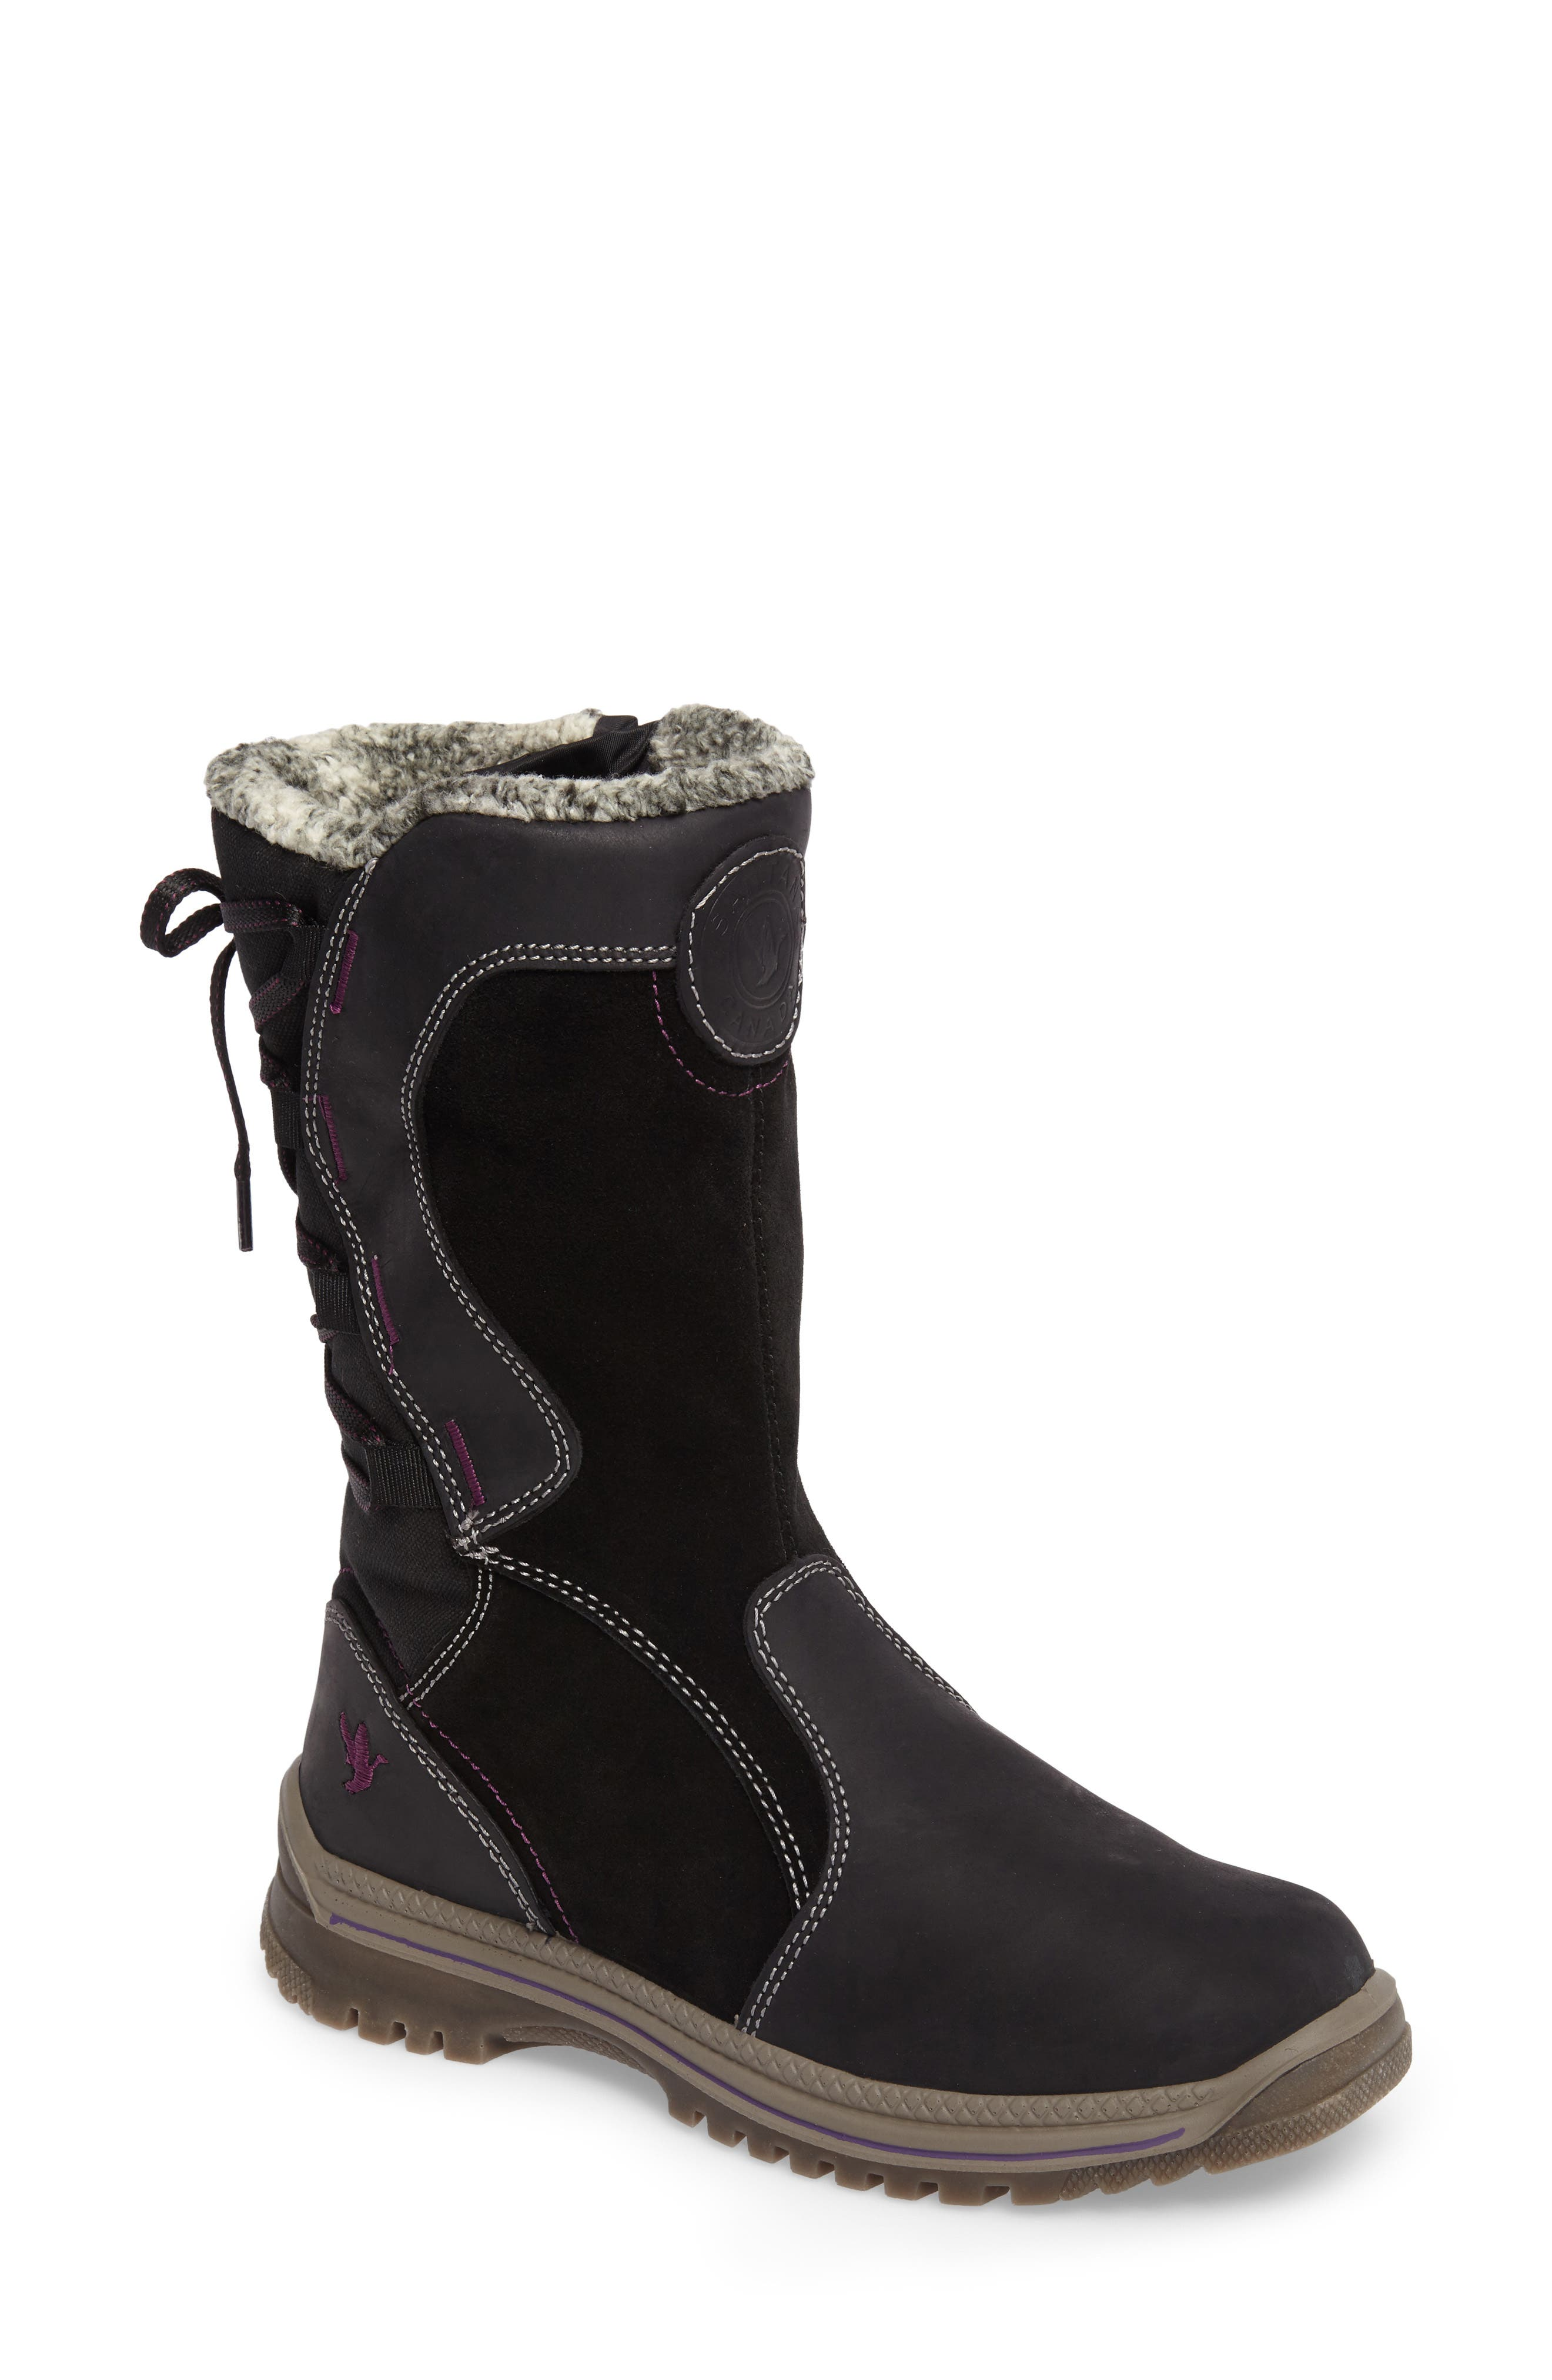 Image of Santana Canada Mayer Faux Fur Lined Waterproof Boot